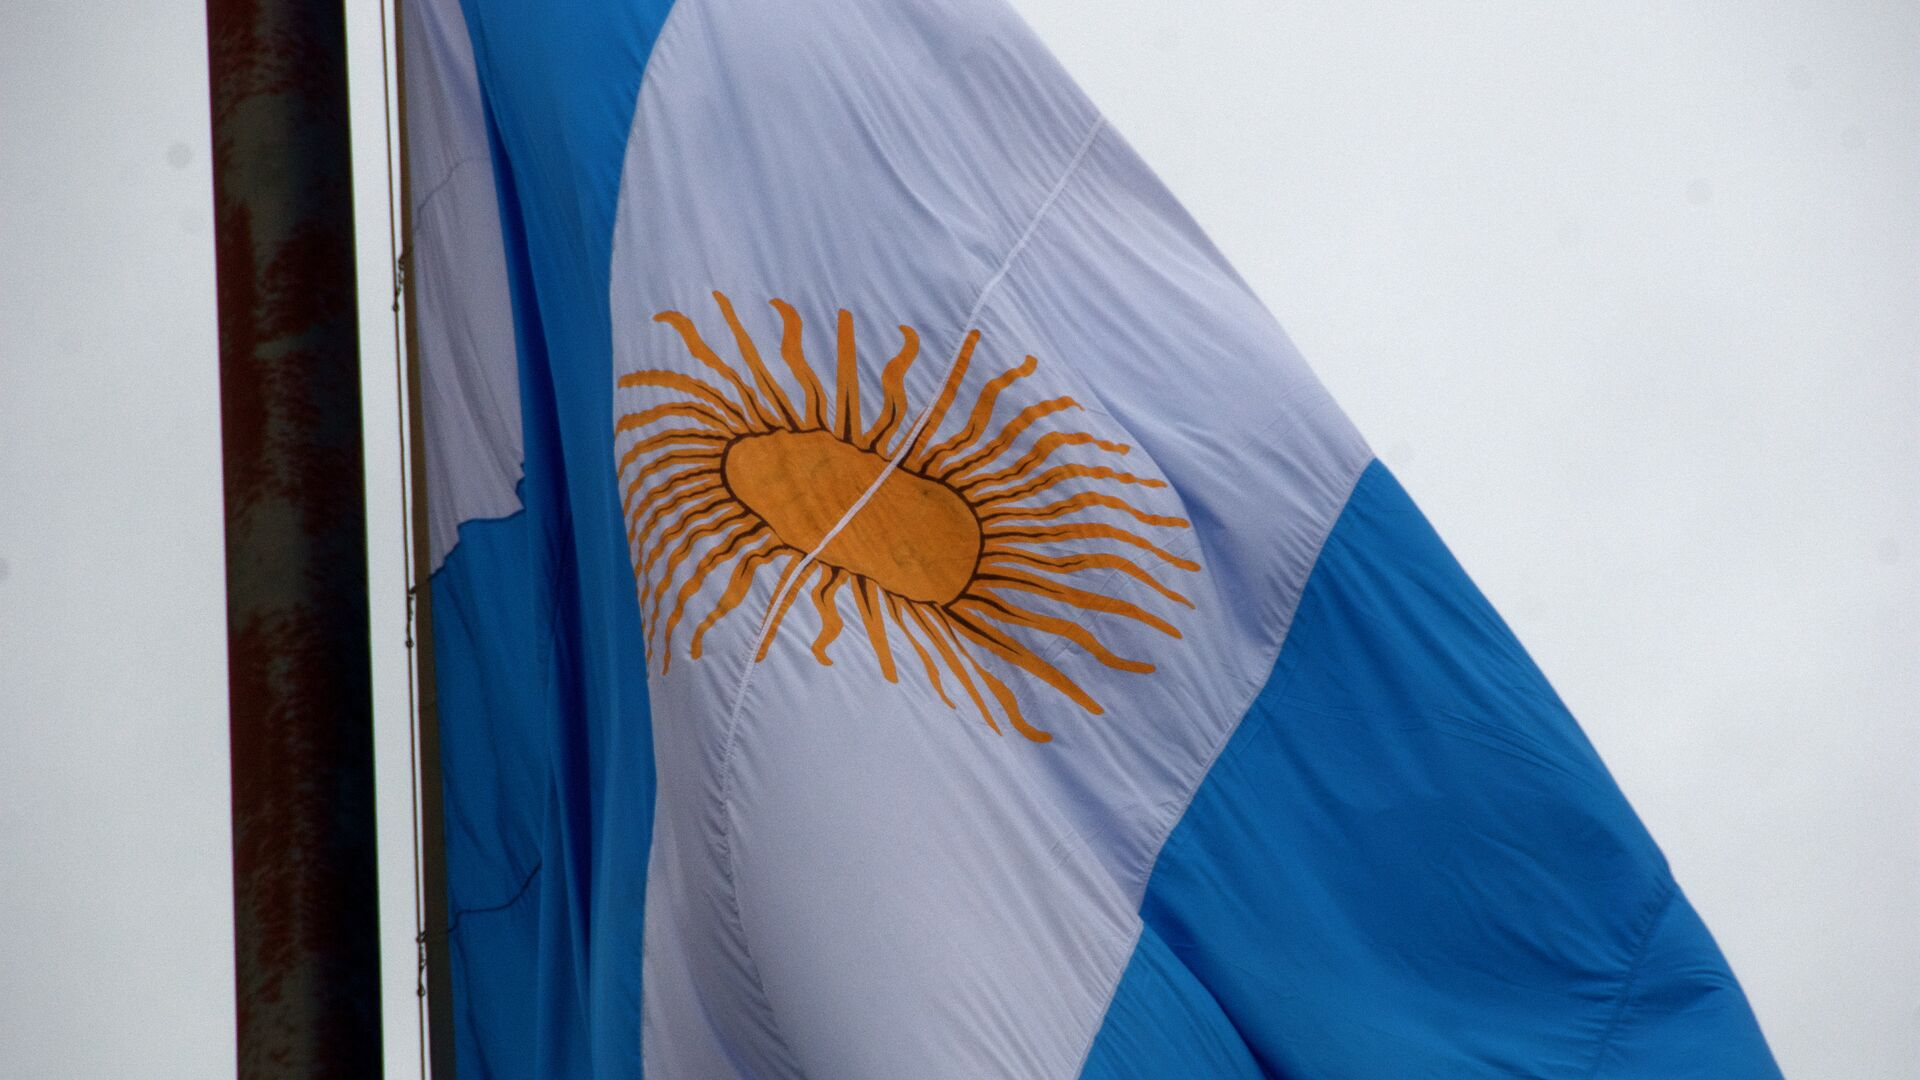 Bandera de Argentina - Sputnik Mundo, 1920, 28.08.2021